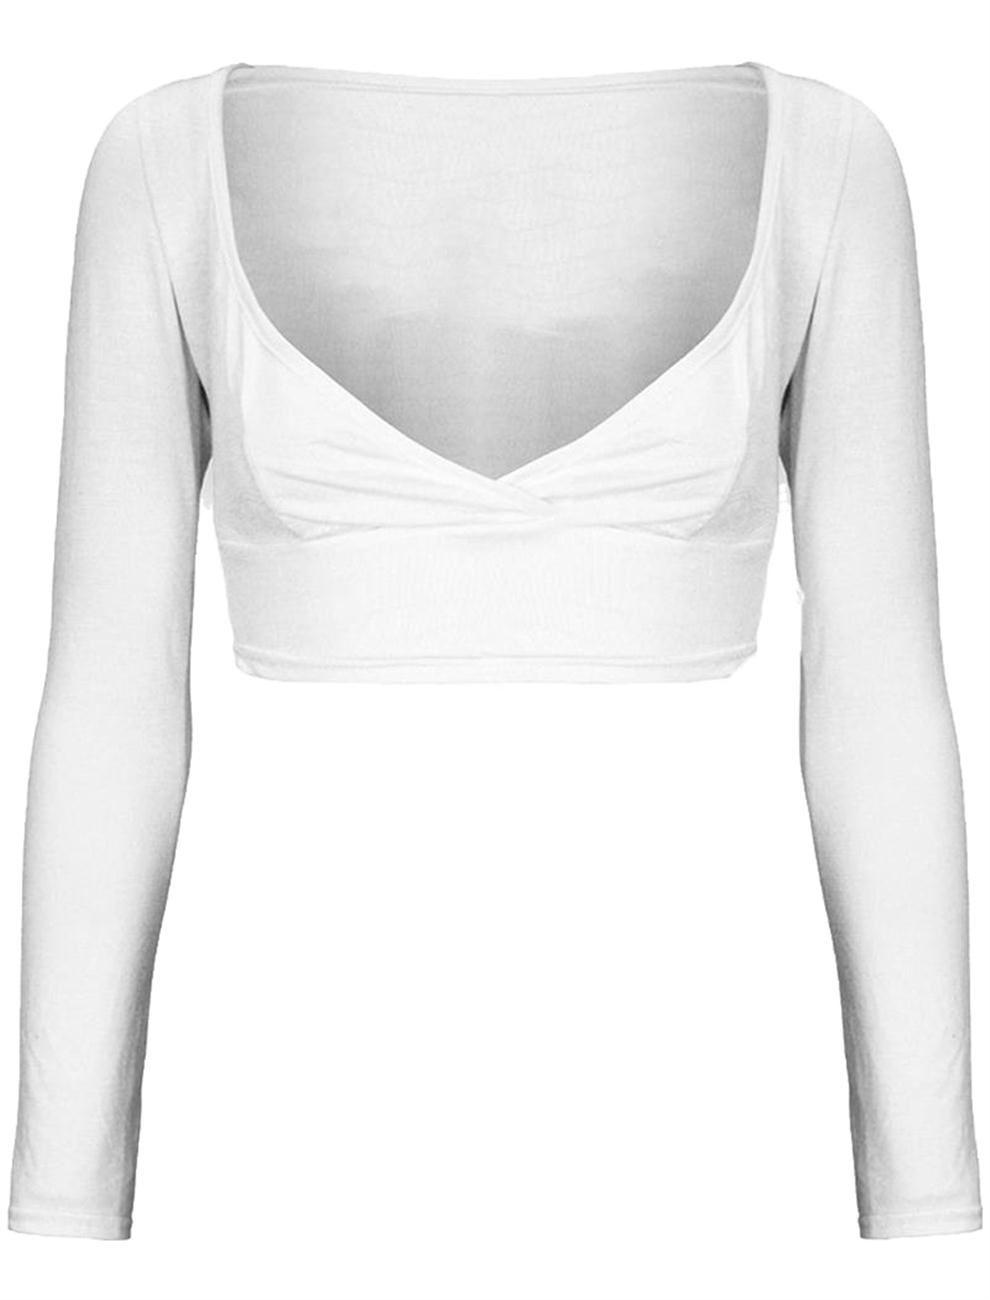 New Ladies Full Sleeve Plunge V-Neck Mini Crop Vest Tops 8-14